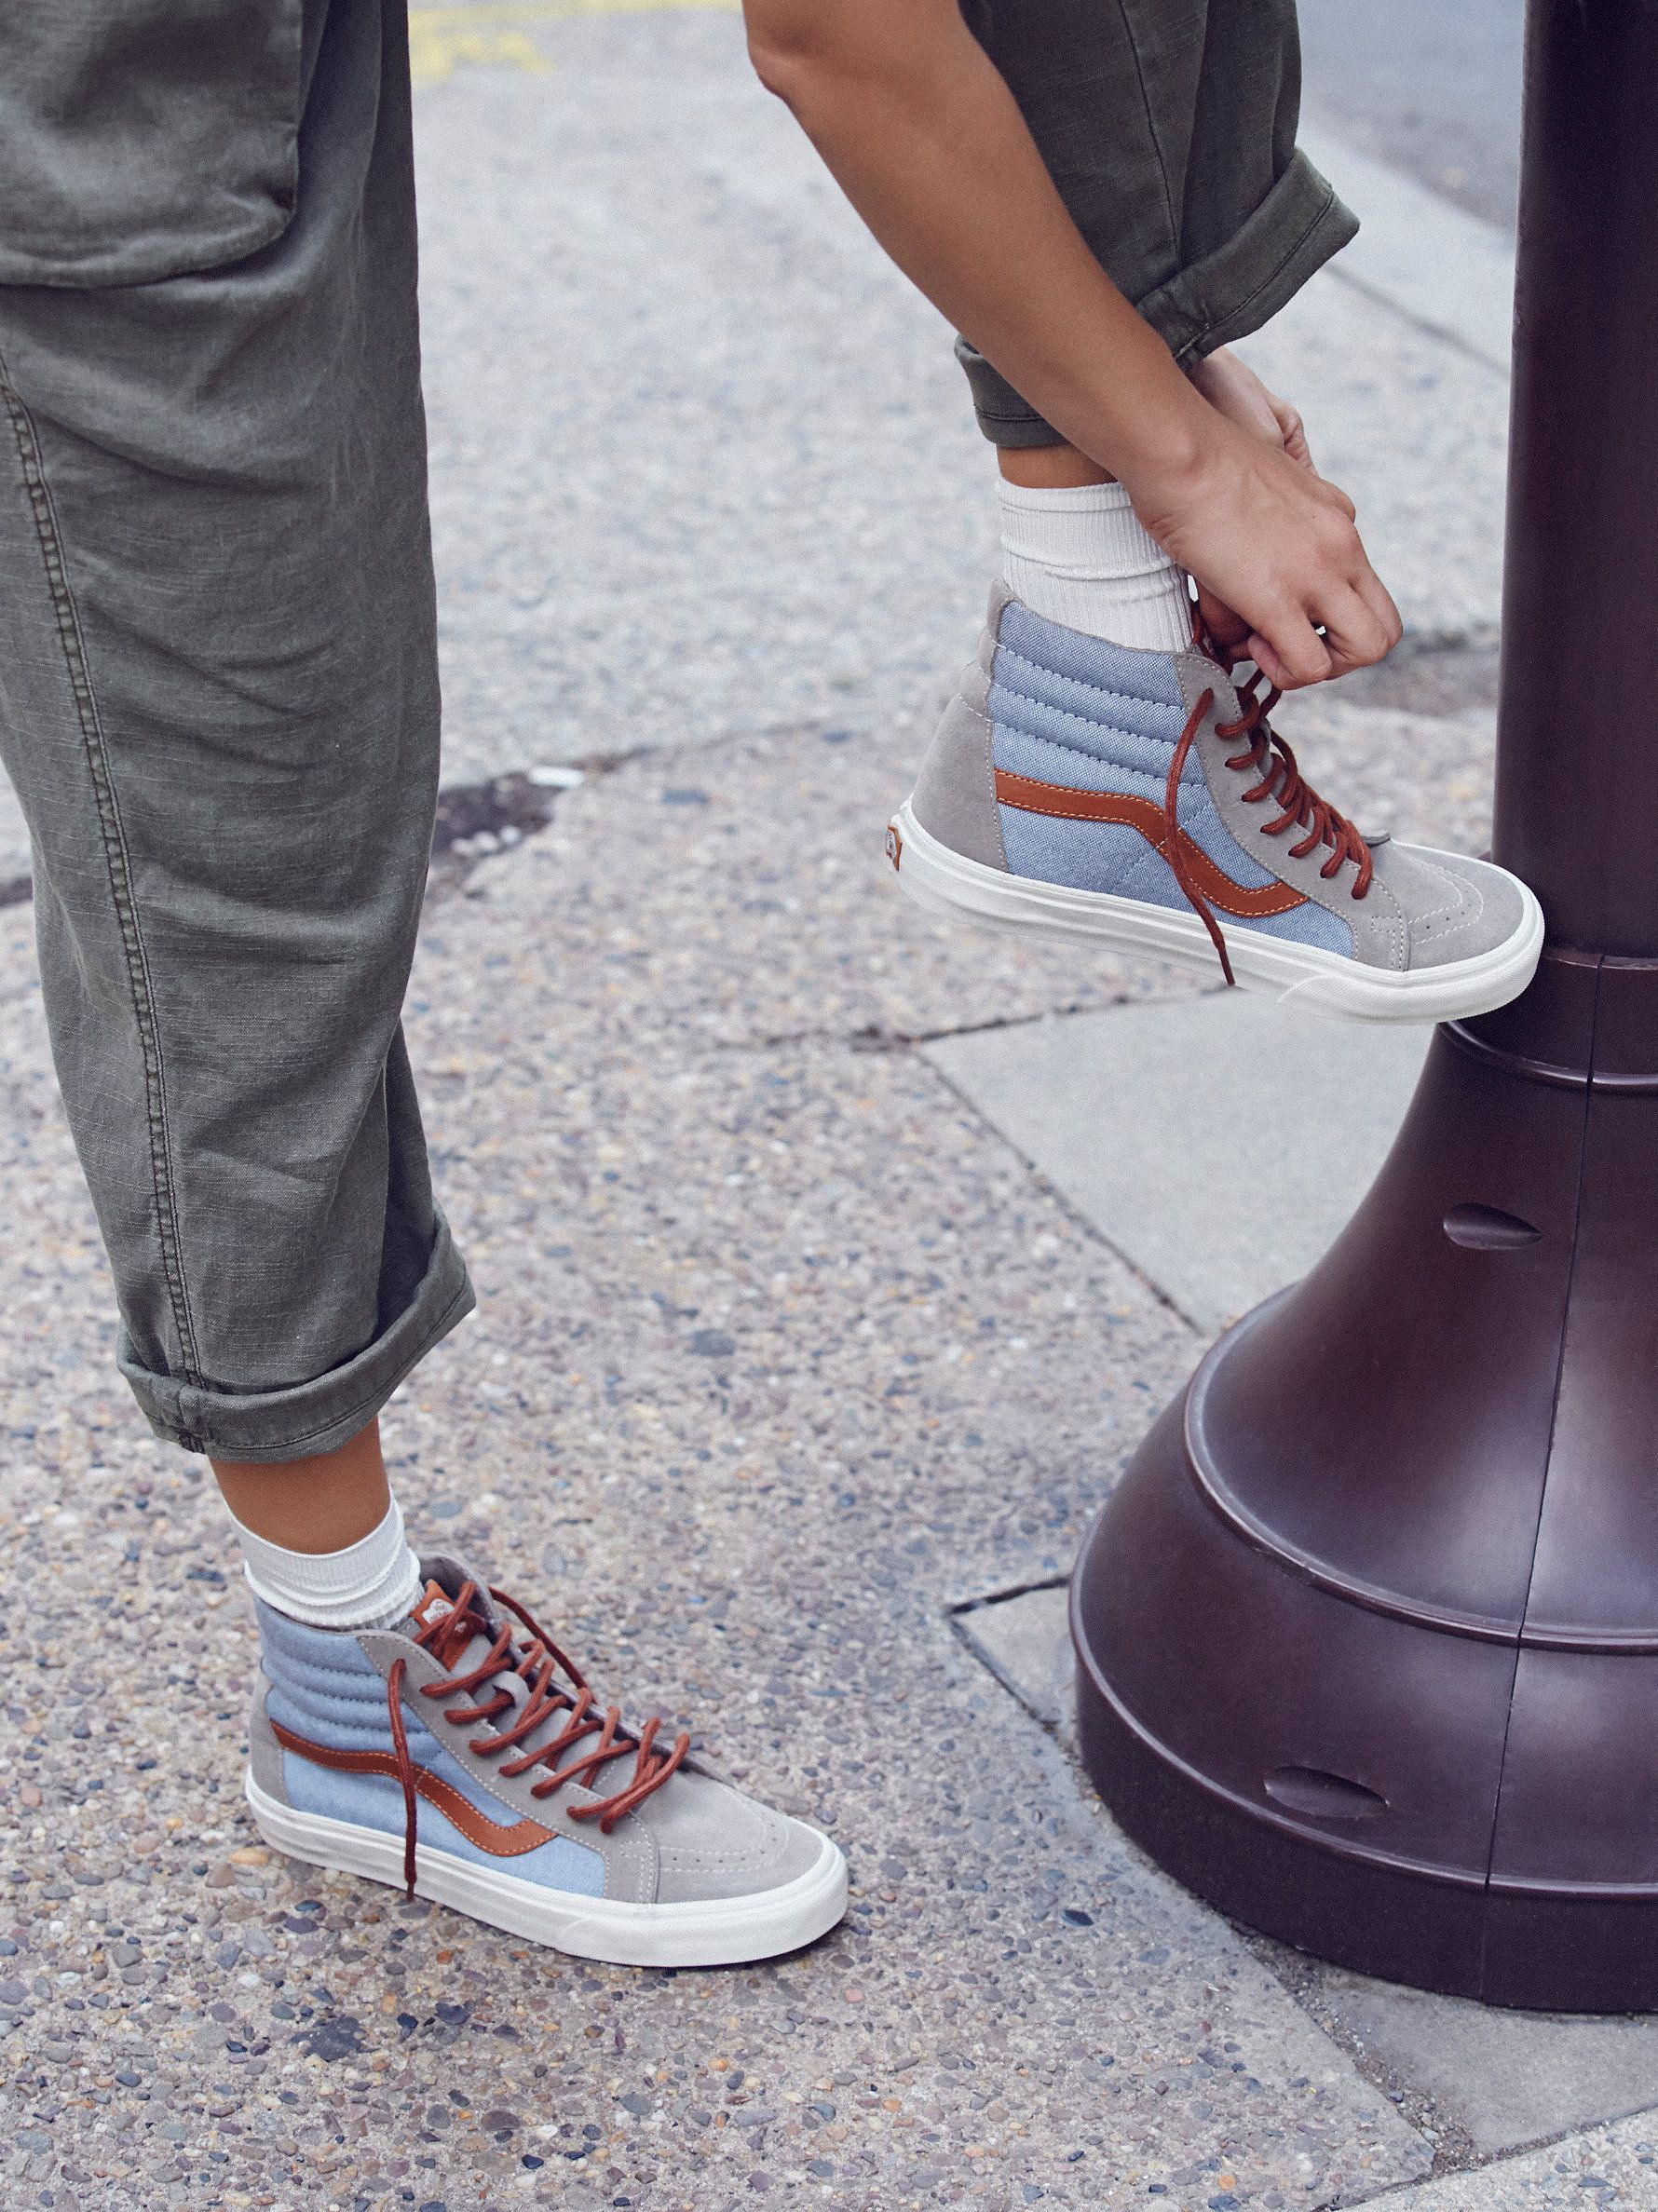 01a9eb8fc651 Sk8-Hi Reissue DX Sneaker